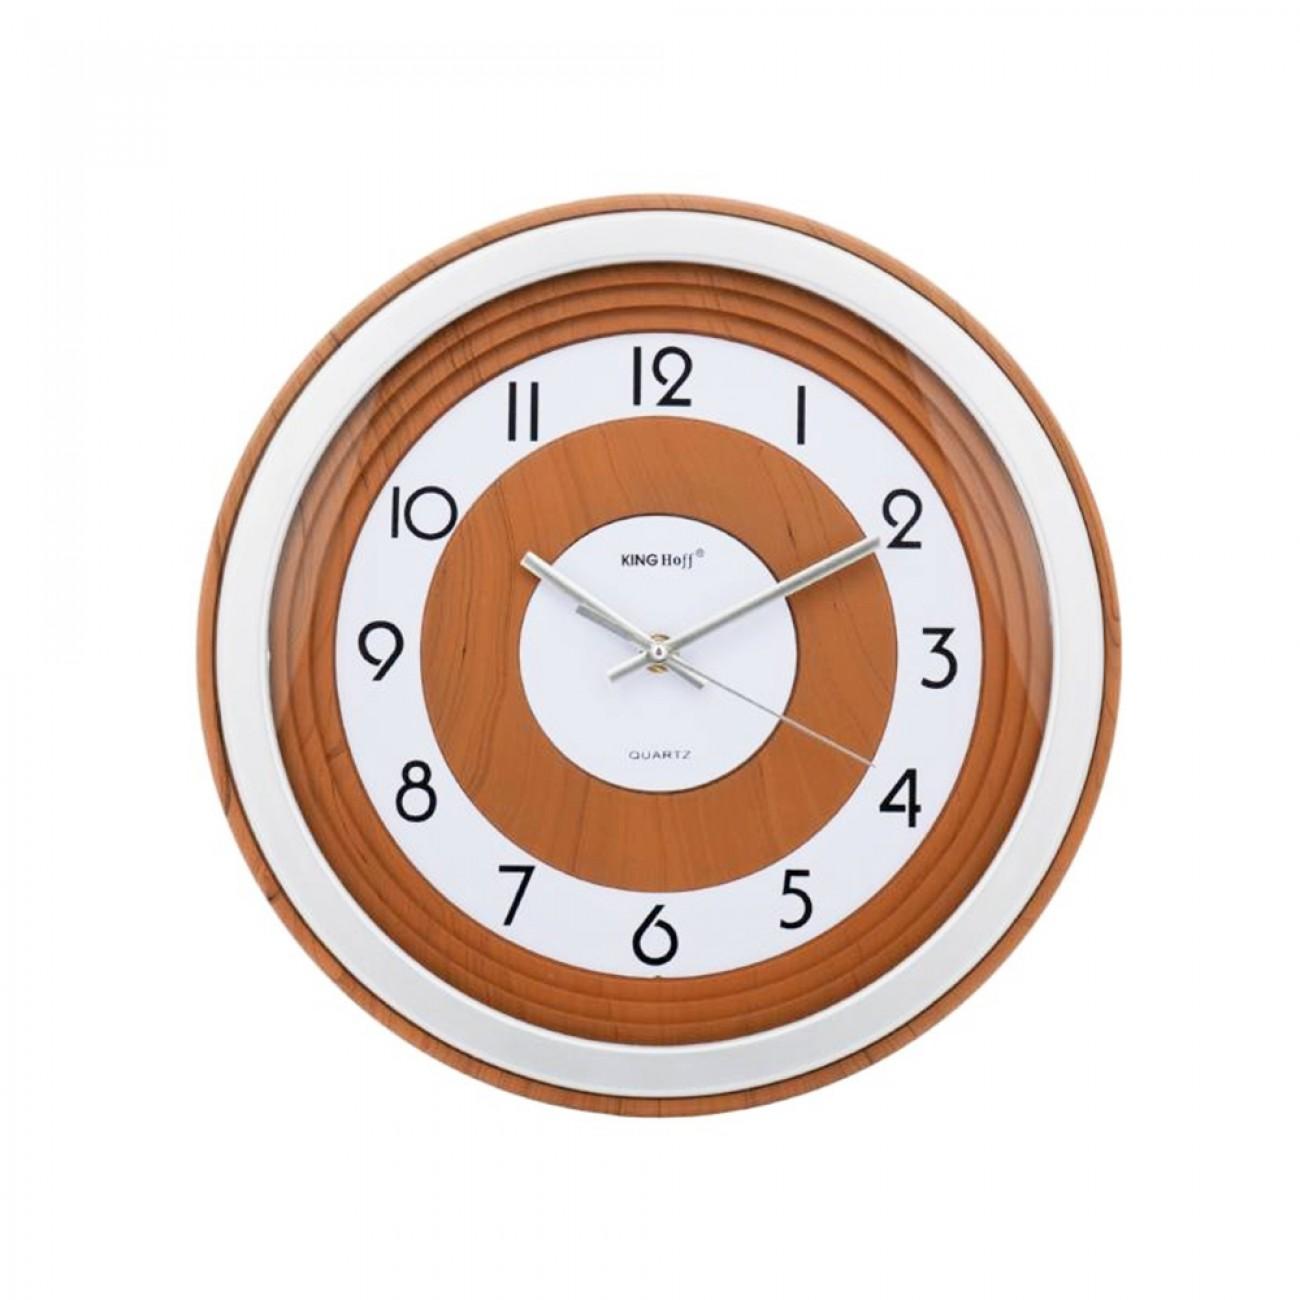 Стенен часовник KingHoff KH 5023, 33 см, Аналогов, Кафяв/бял в Стенни часовници - Kinghoff | Alleop